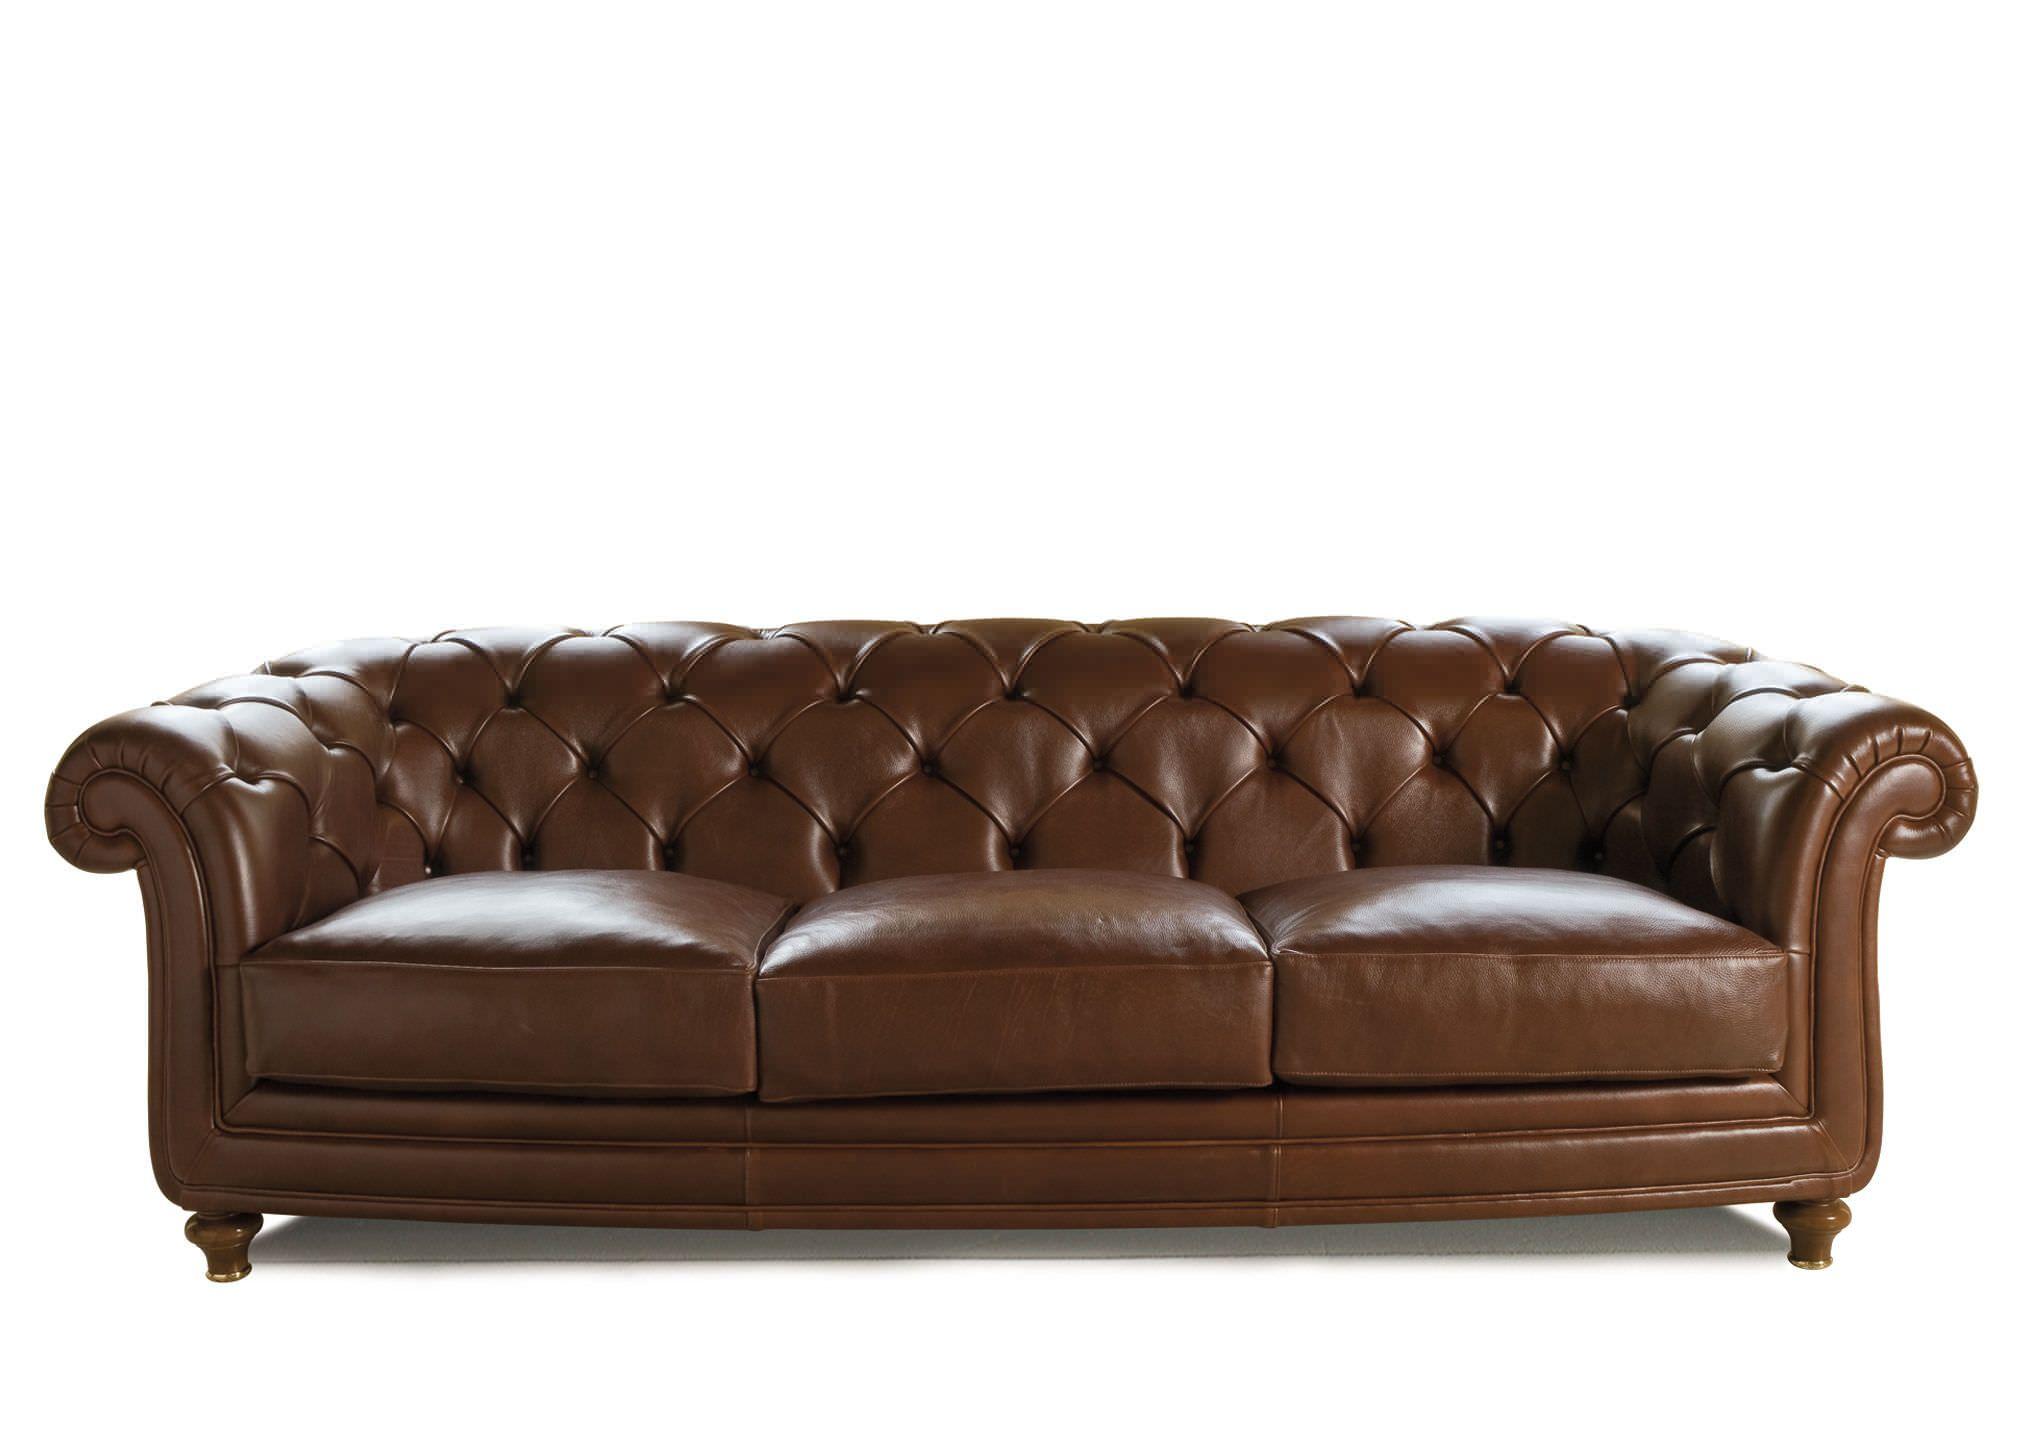 Sofa Leder Chesterfield Suites Tan Chesterfield Sofa Grau Samt